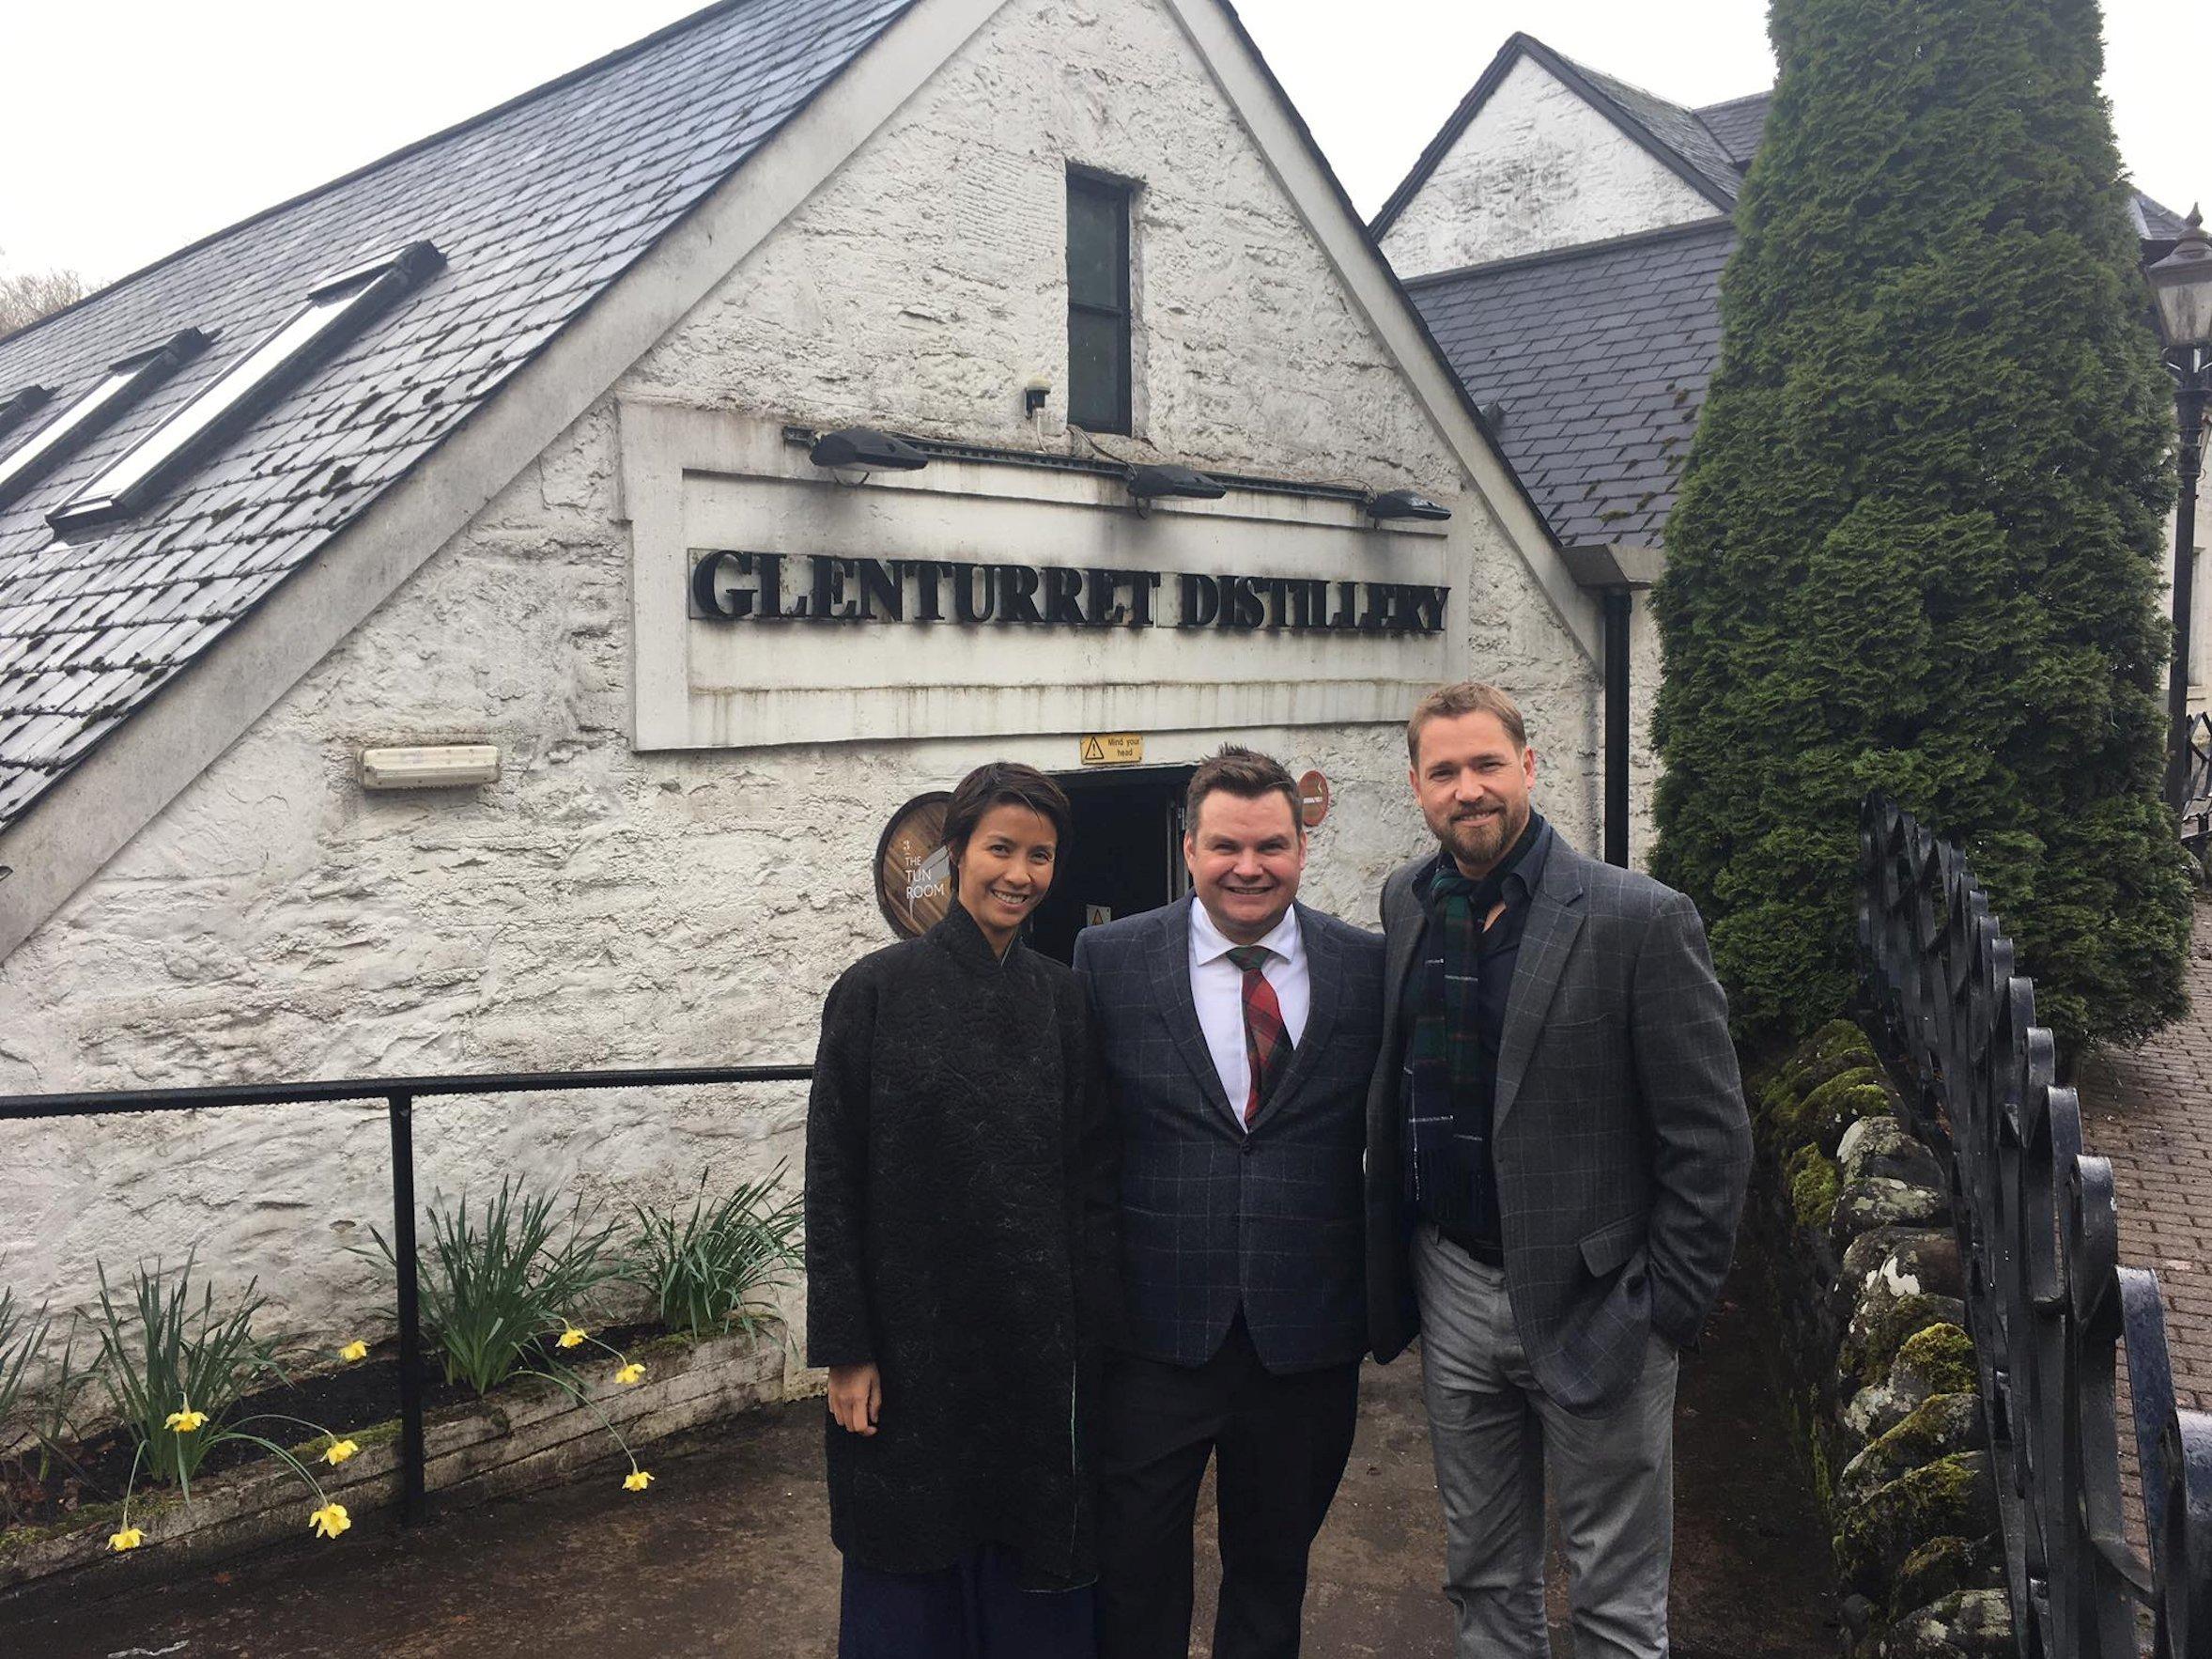 Delphine Yip, Glenturret Distillery general manager Stuart Cassells and Grant Horsfield.